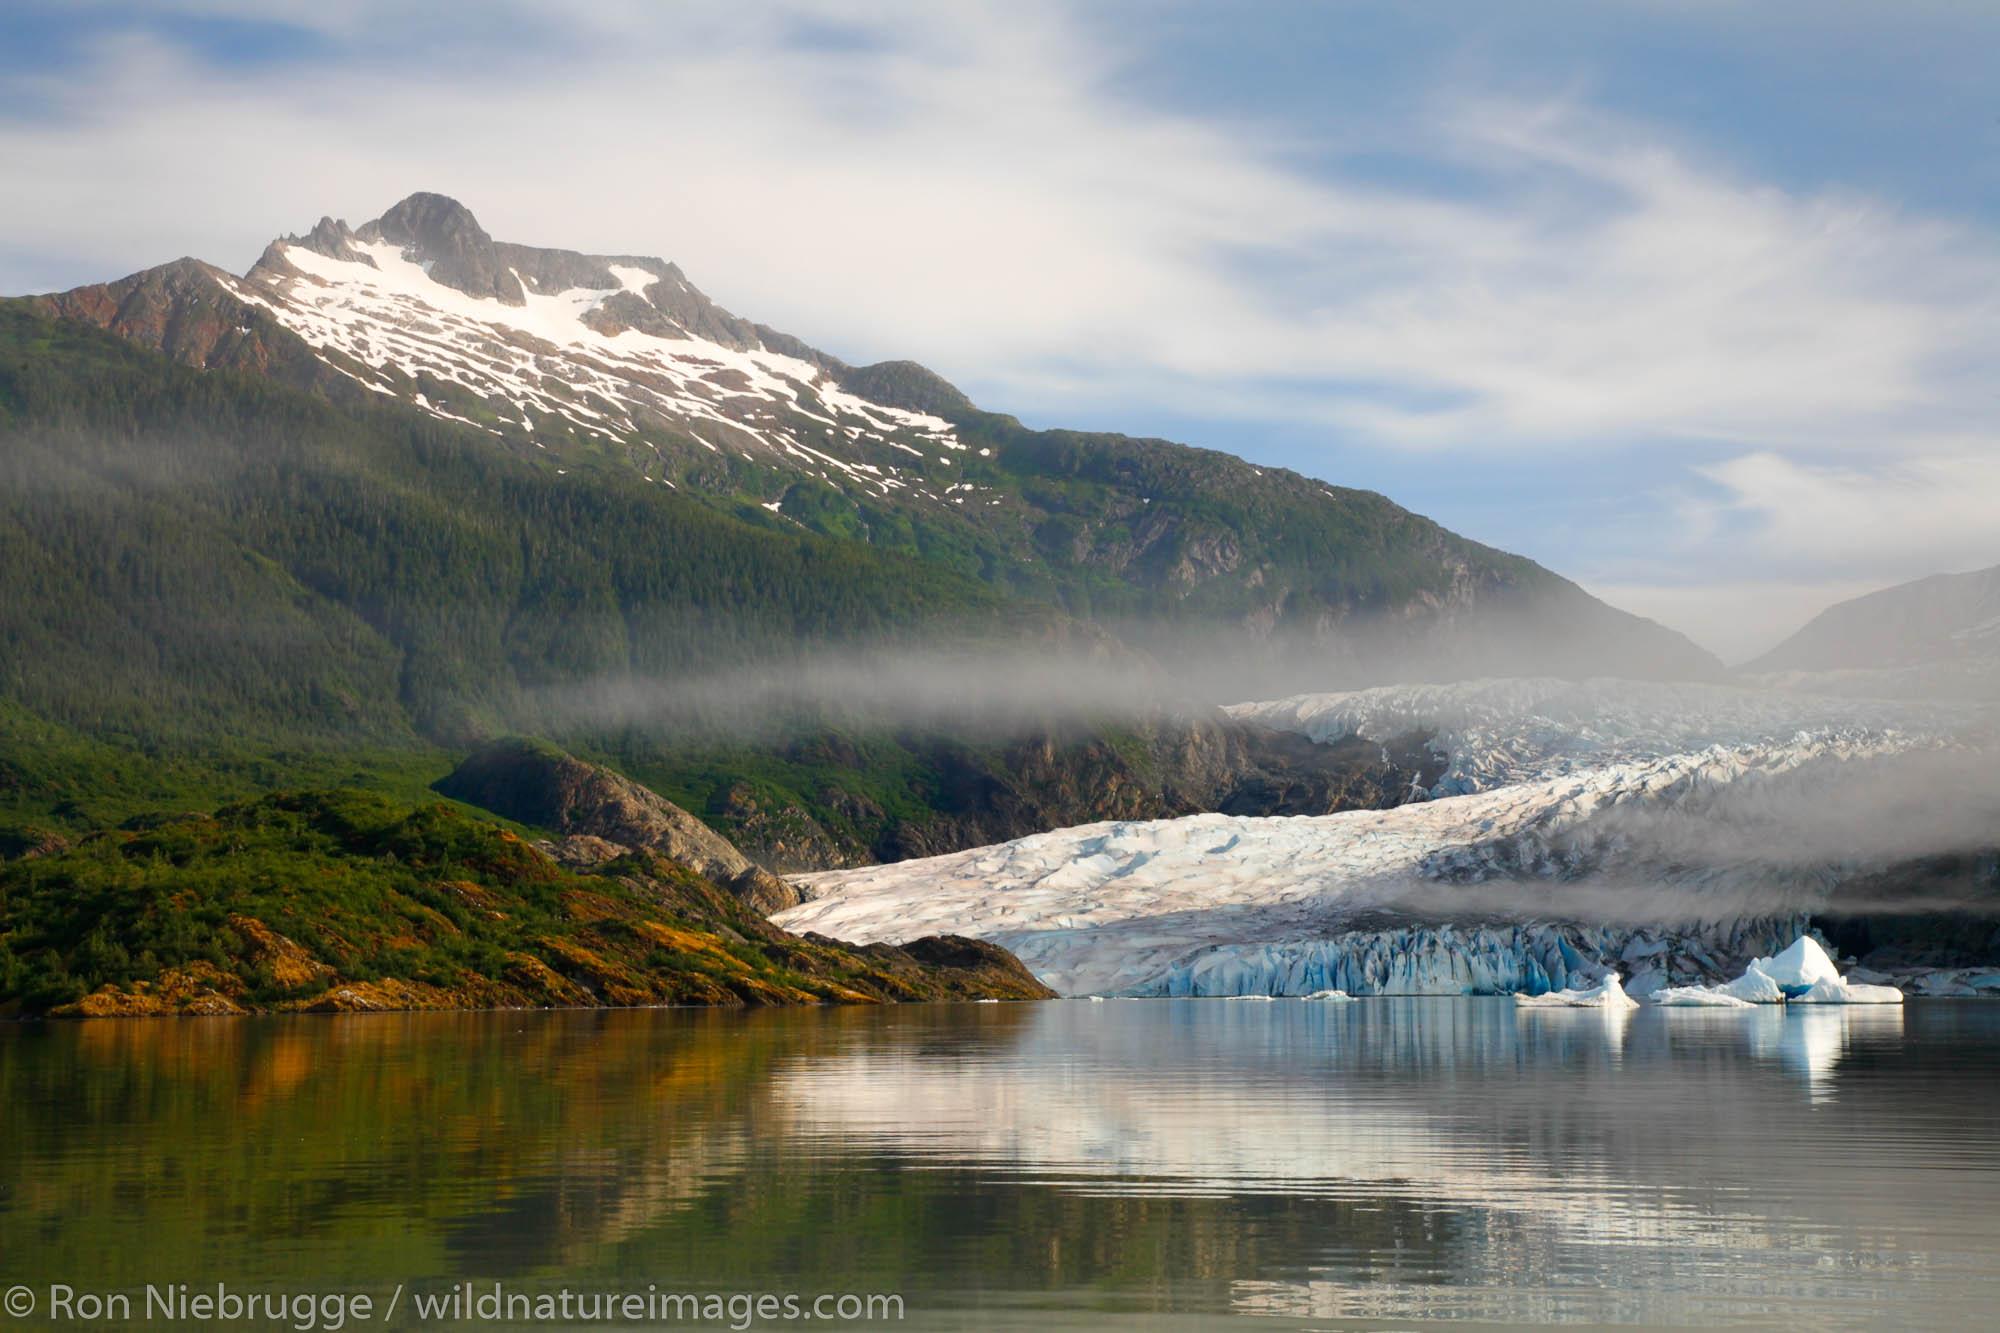 Mendenhall Glacier and Lake near Juneau, Alaska.